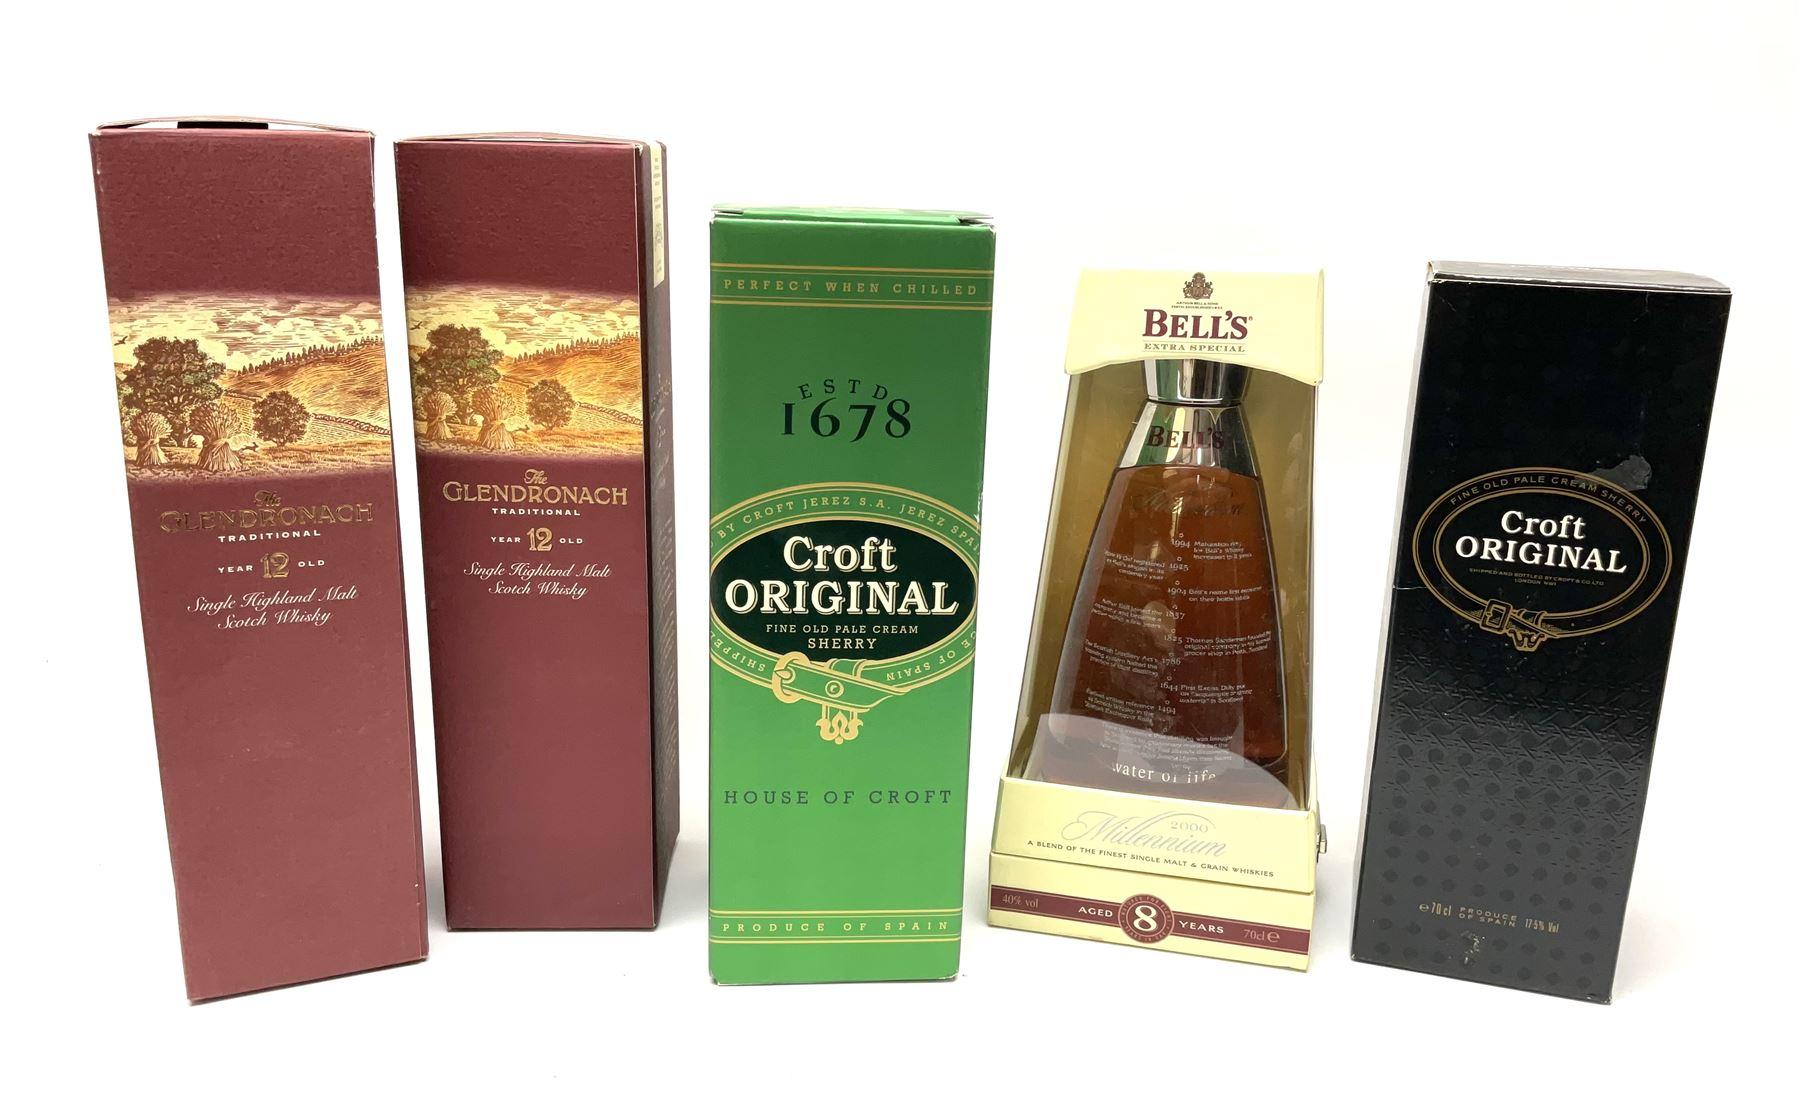 Bell's Millennium 2000 blended single malt and grain whisky aged 8 years